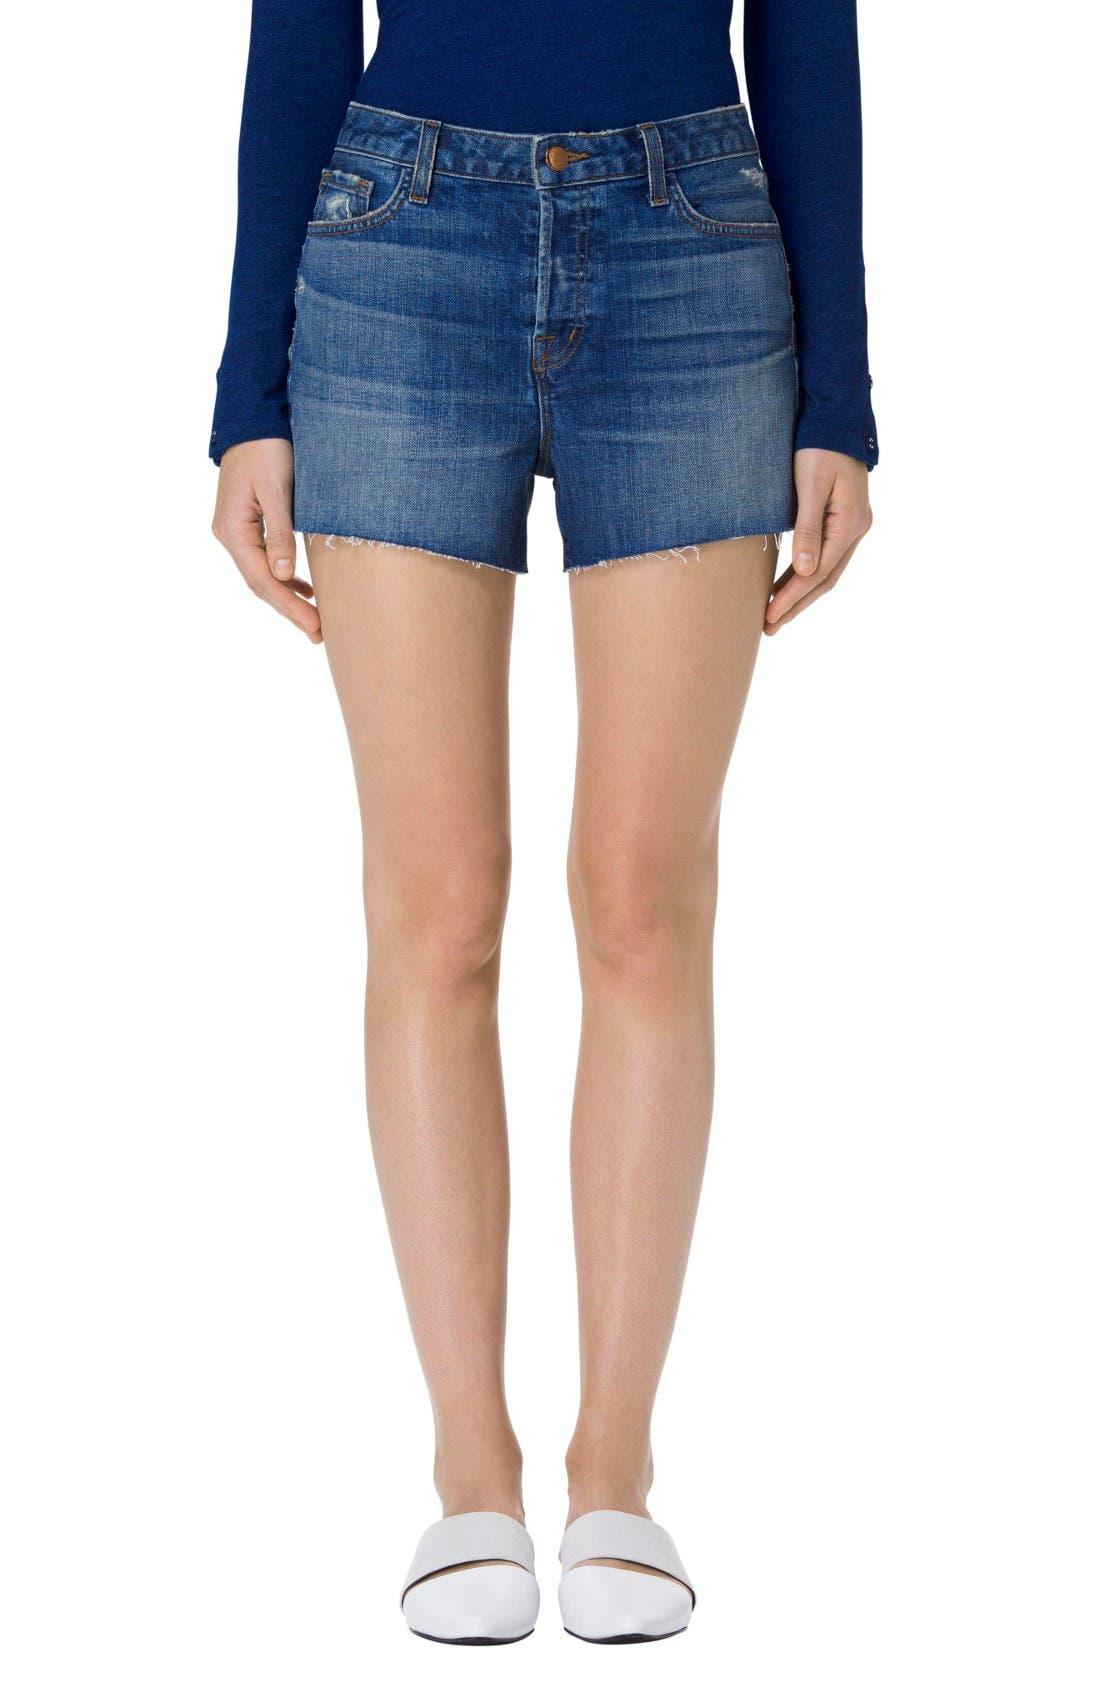 J BRAND Gracie High Rise Cutoff Shorts